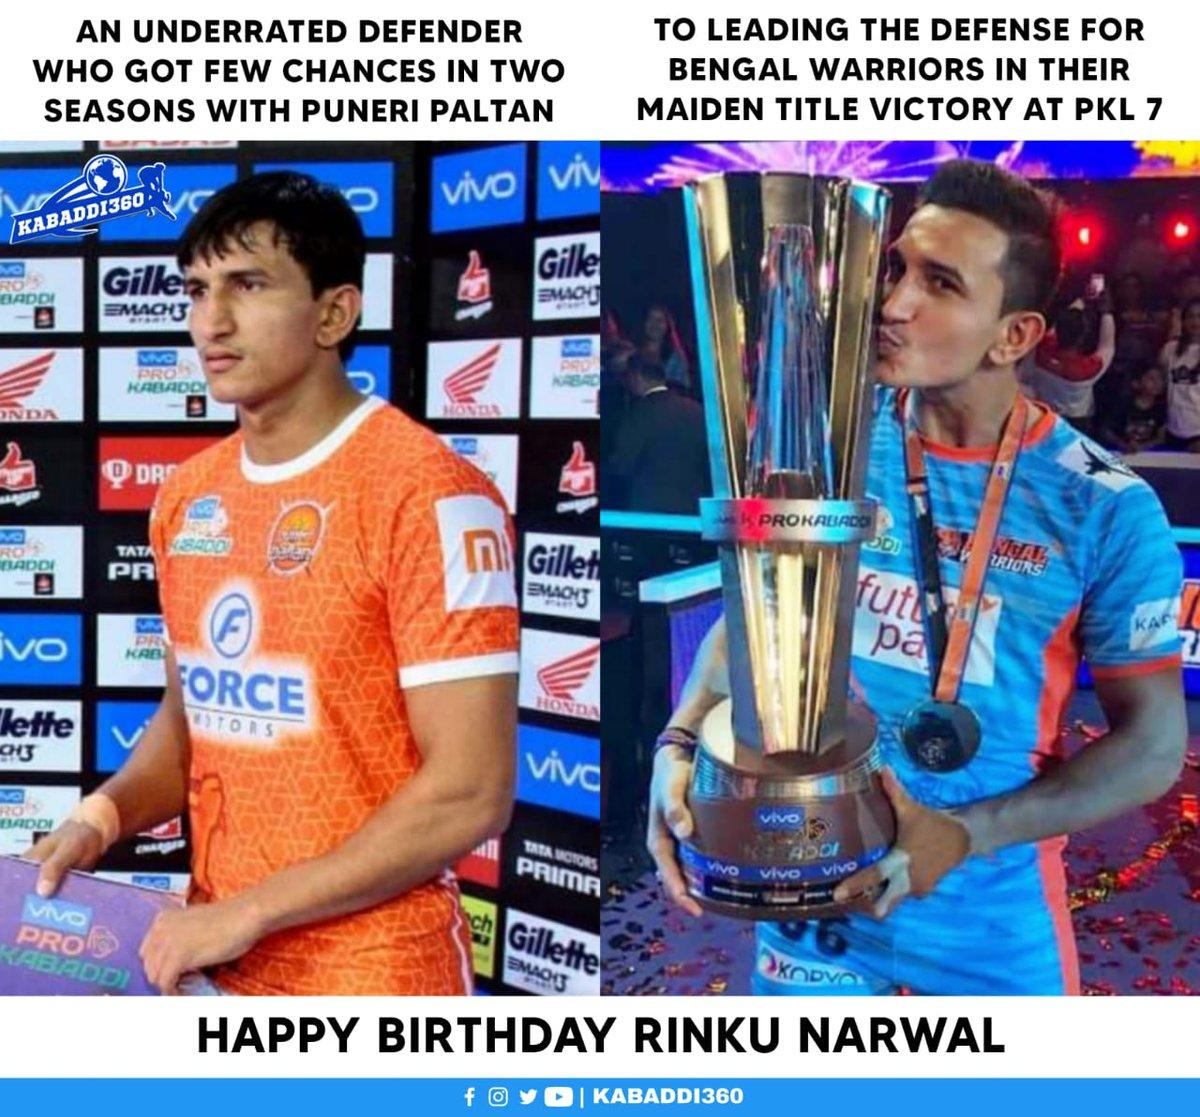 ✅ 6th best defender of PKL 7 with 64 tackle points & 4 High 5s  Happy birthday Rinku Narwal 🥳  #RinkuNarwal #HappyBirthday #Kabaddi360